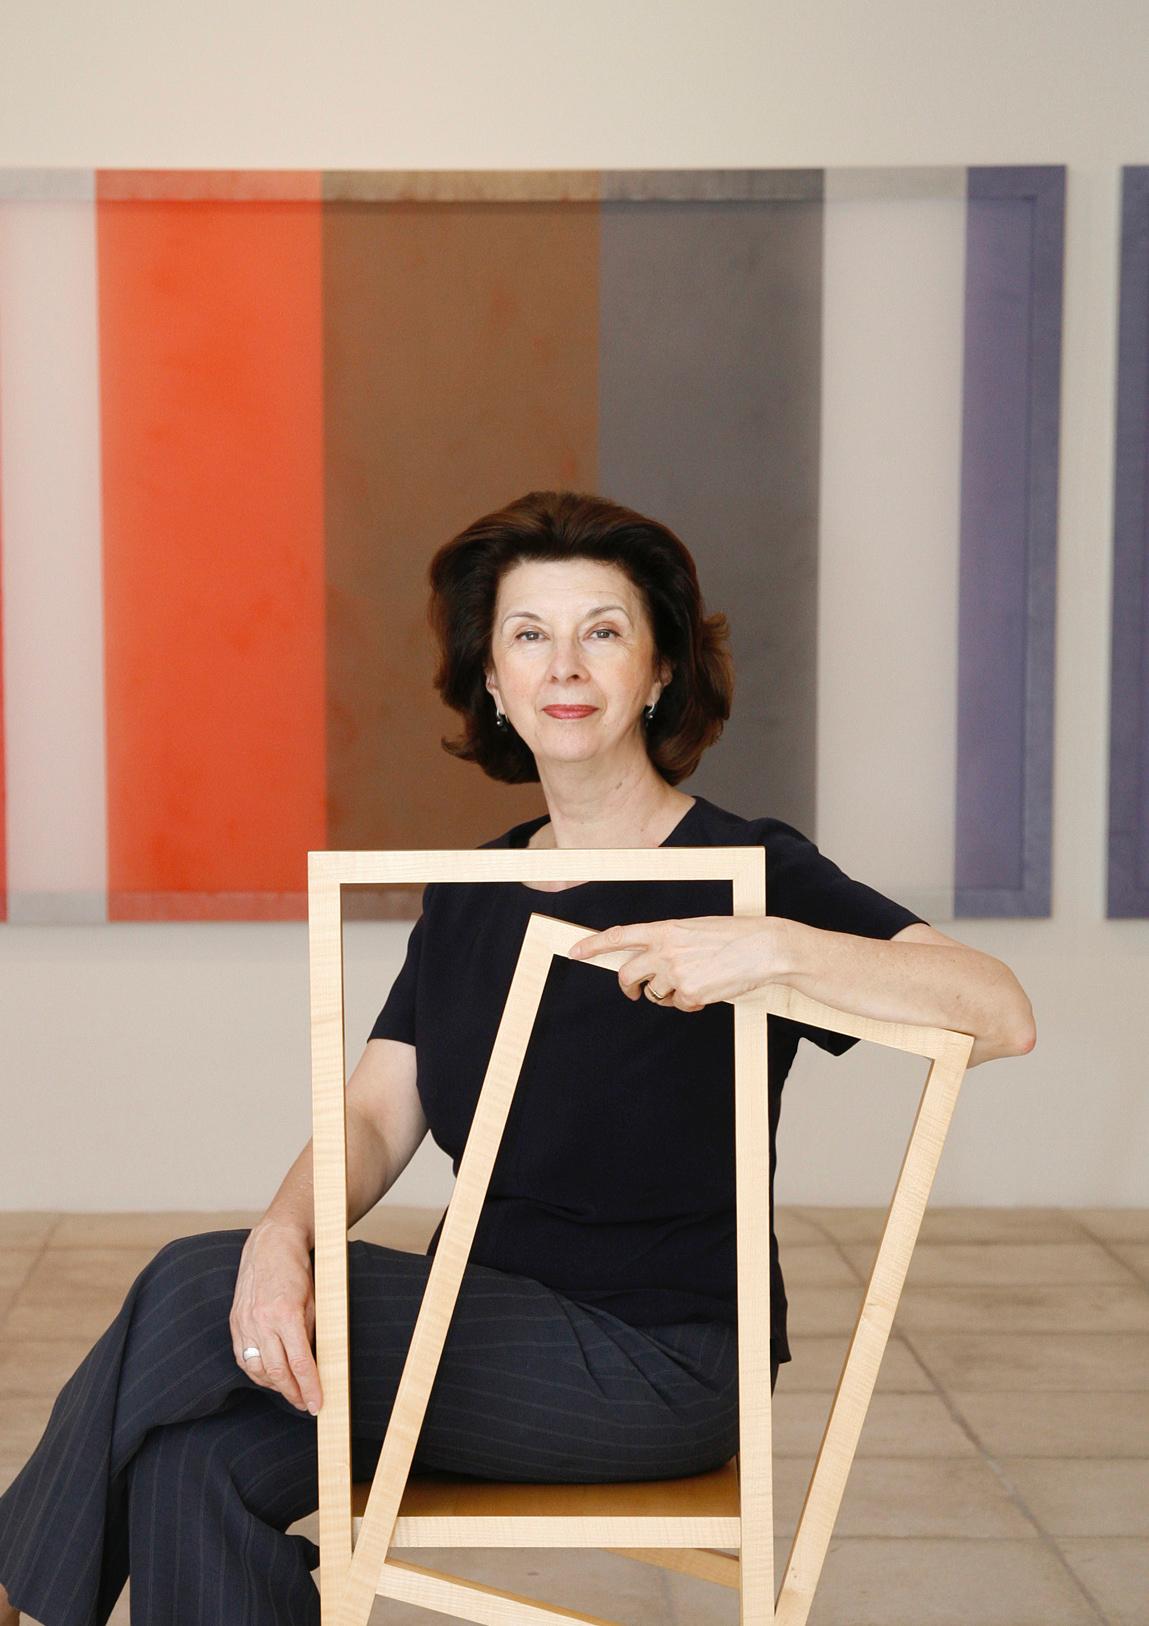 Jean Charles Blais à la Galerie Catherine Issert